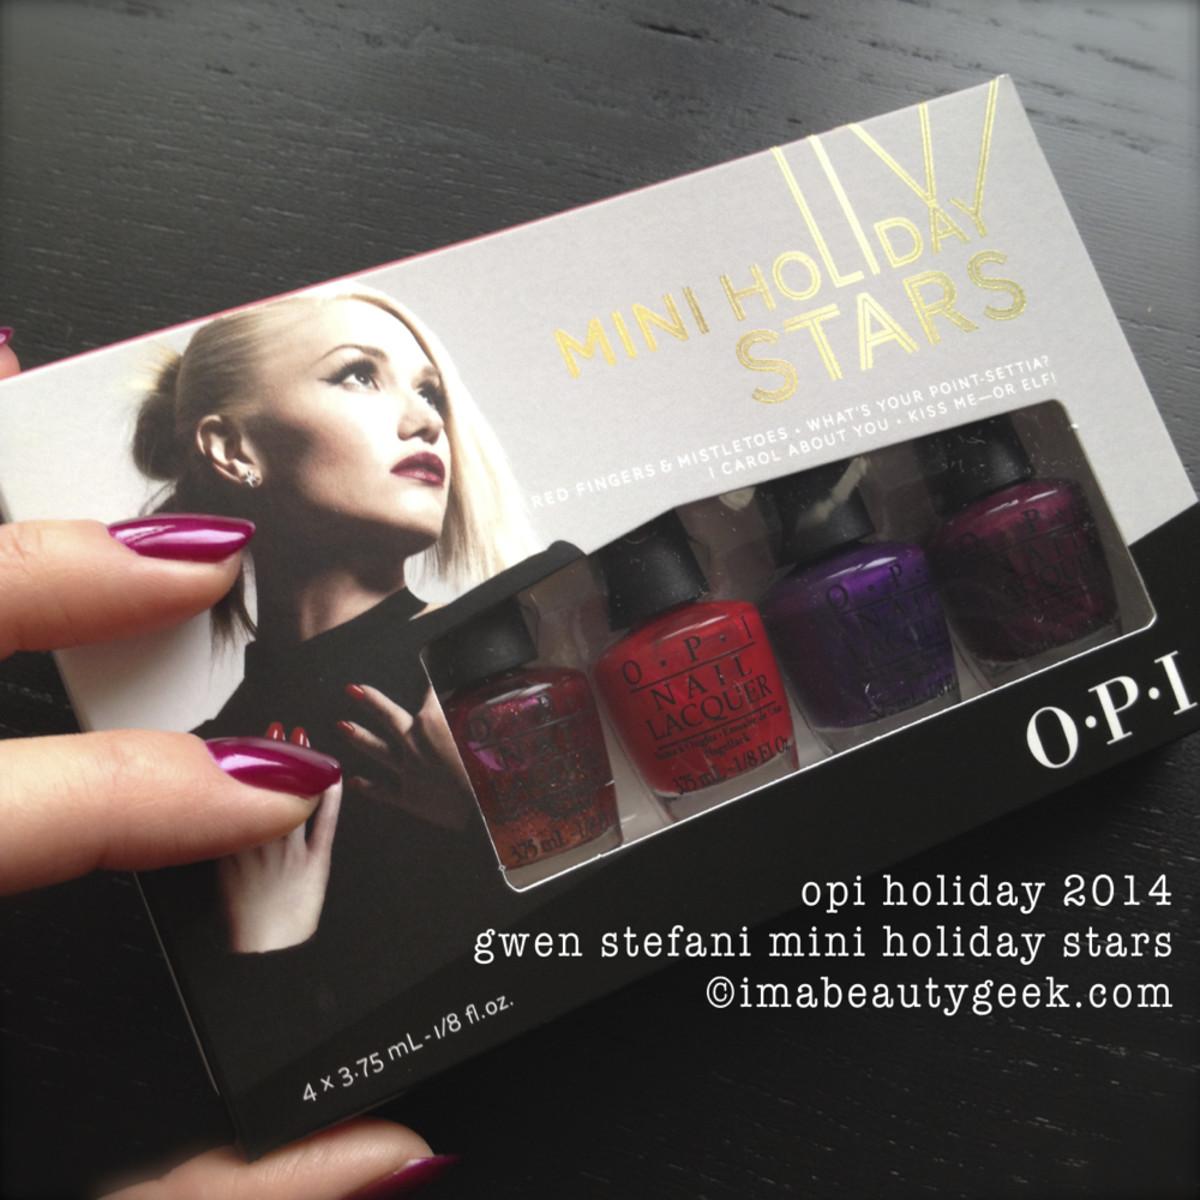 OPI Holiday 2014 Gwen Stefani Mini Holiday Stars